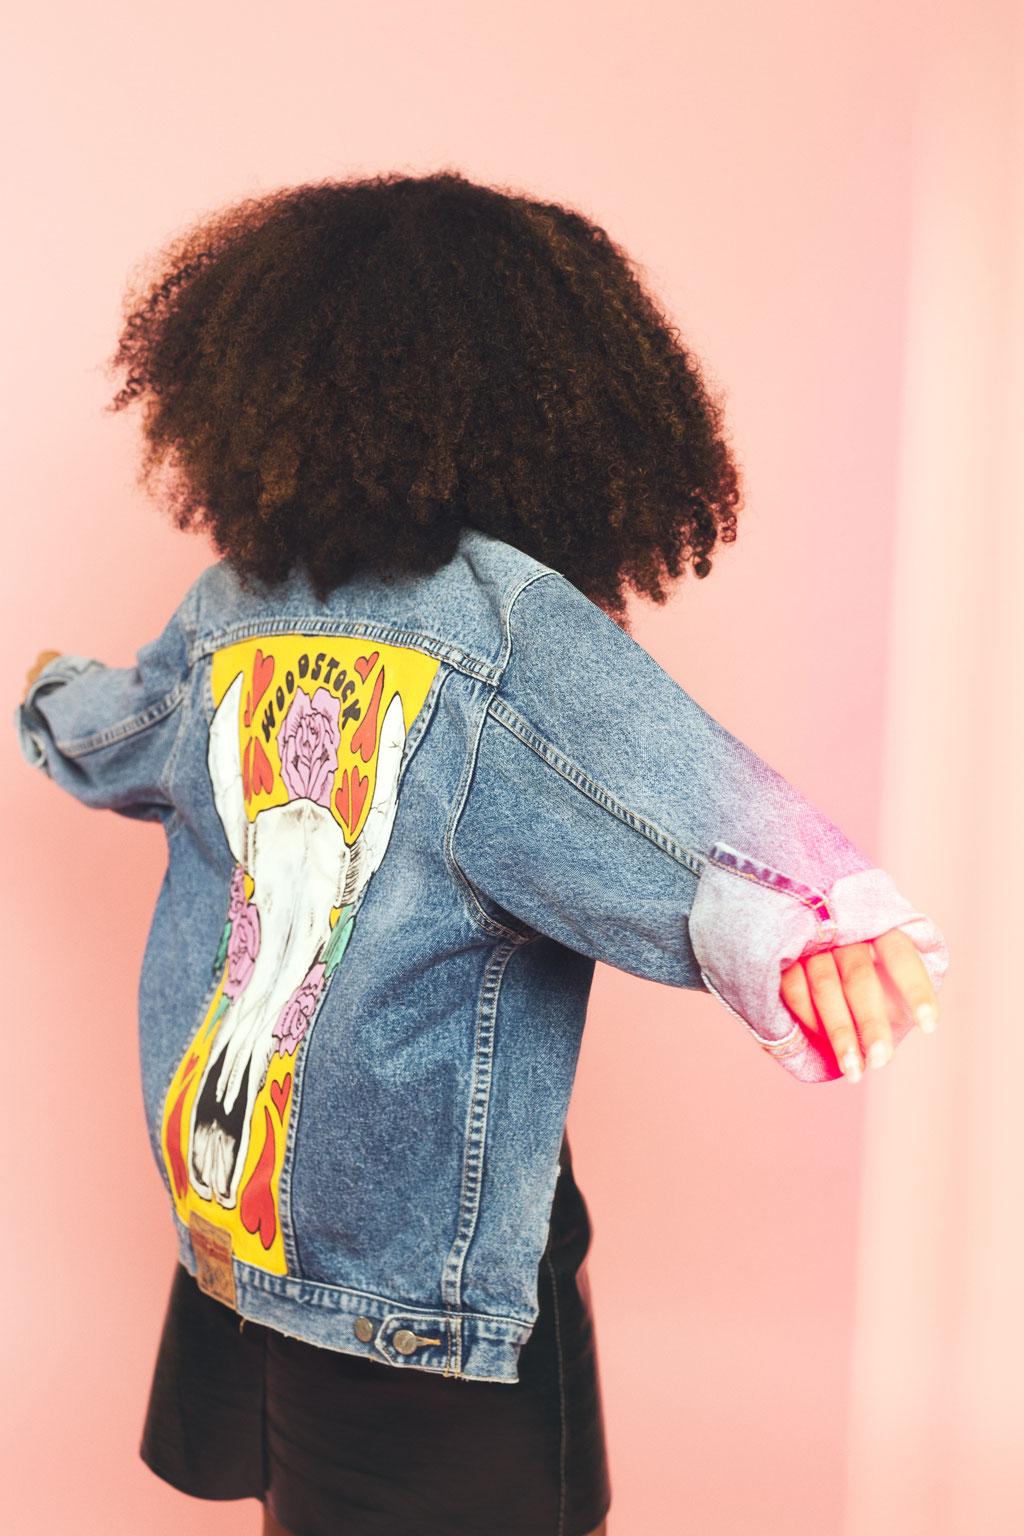 Jackets - The Dutch Rebel. Photography - Landa Penders. Styling - Studio XO. Make-up & Hair - Mahzad Mirzaei. Models - Esther B. & Chelsey R.